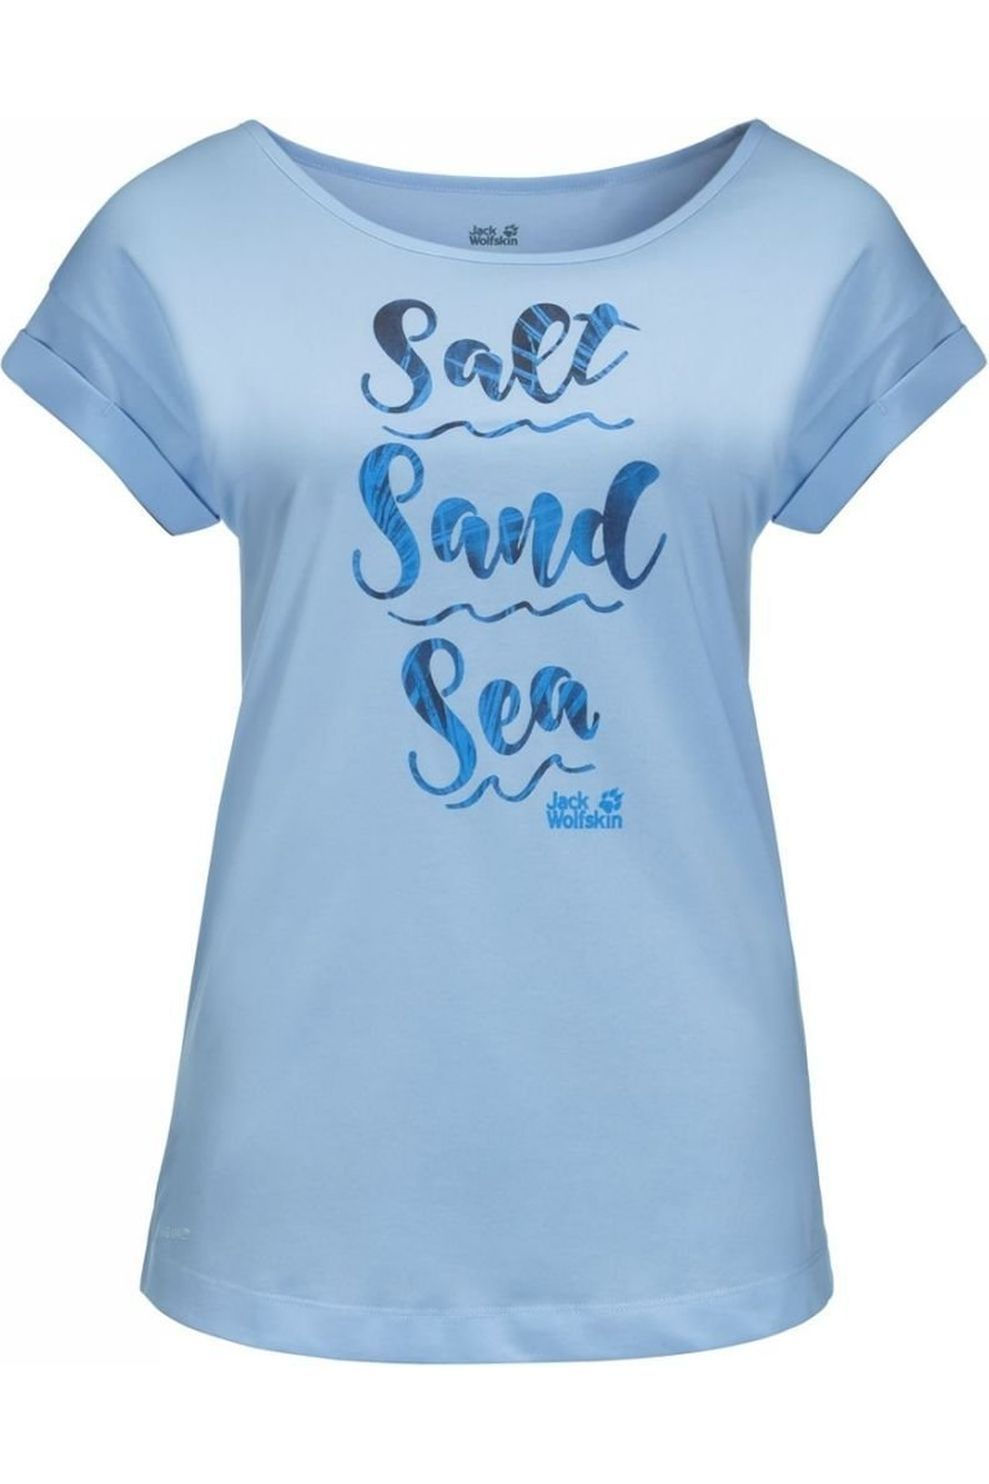 Jack Wolfskin T-Shirt Salt Sand Sea voor dames Blauw Maten: XS, S, M, L, XL, XXL